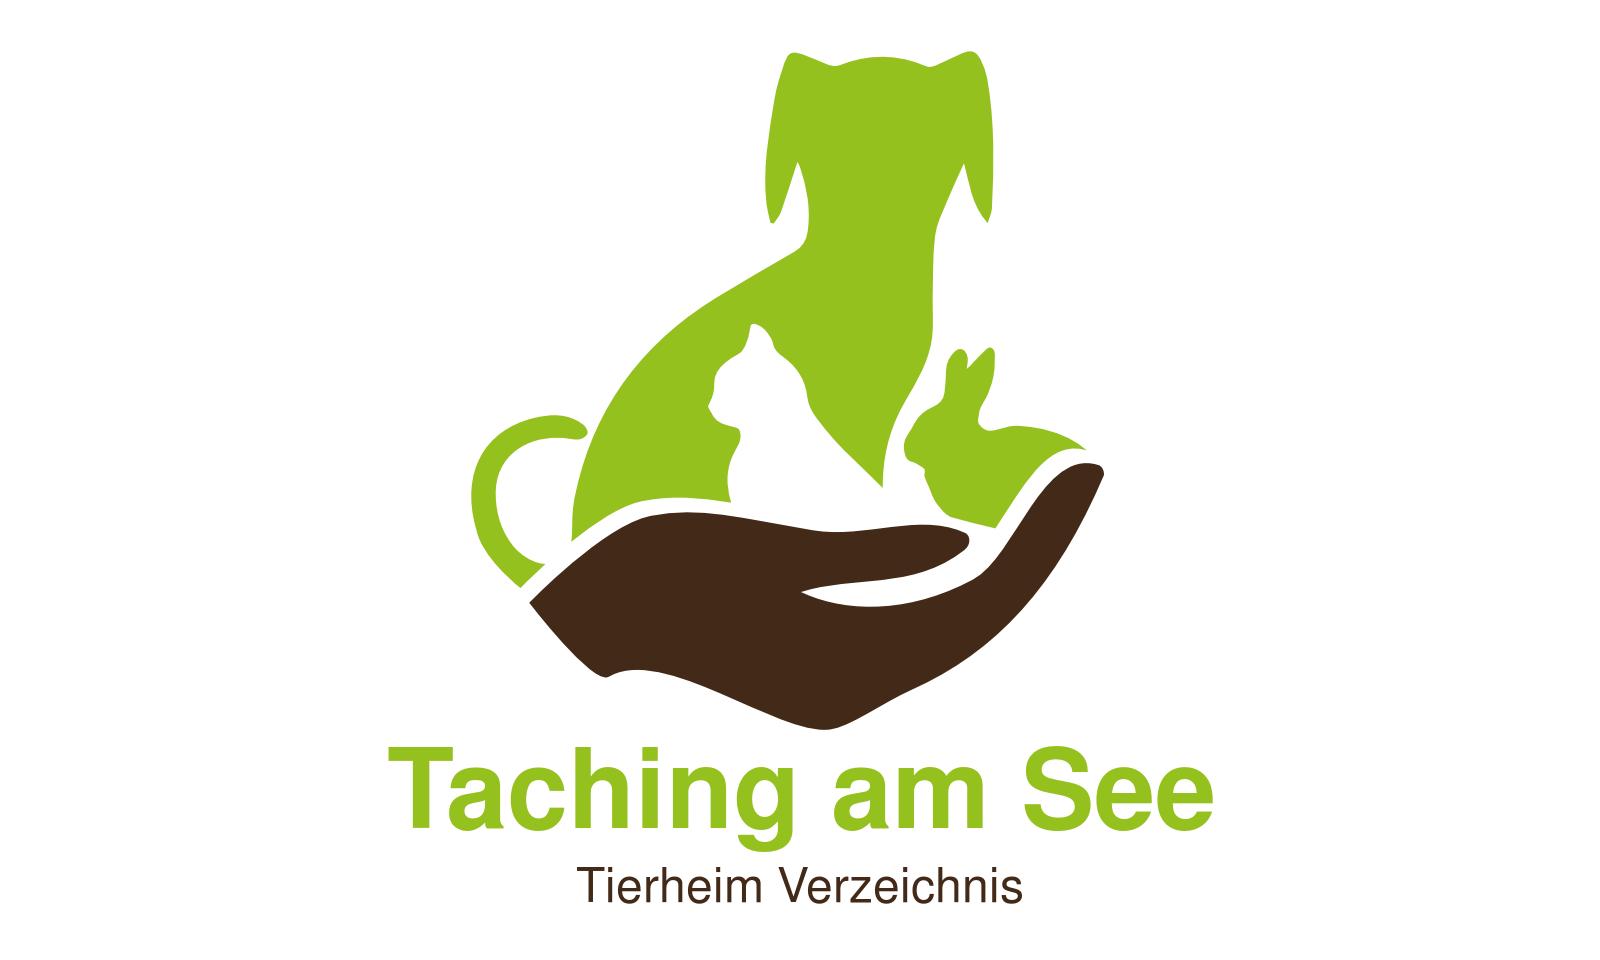 Tierheim Taching am See